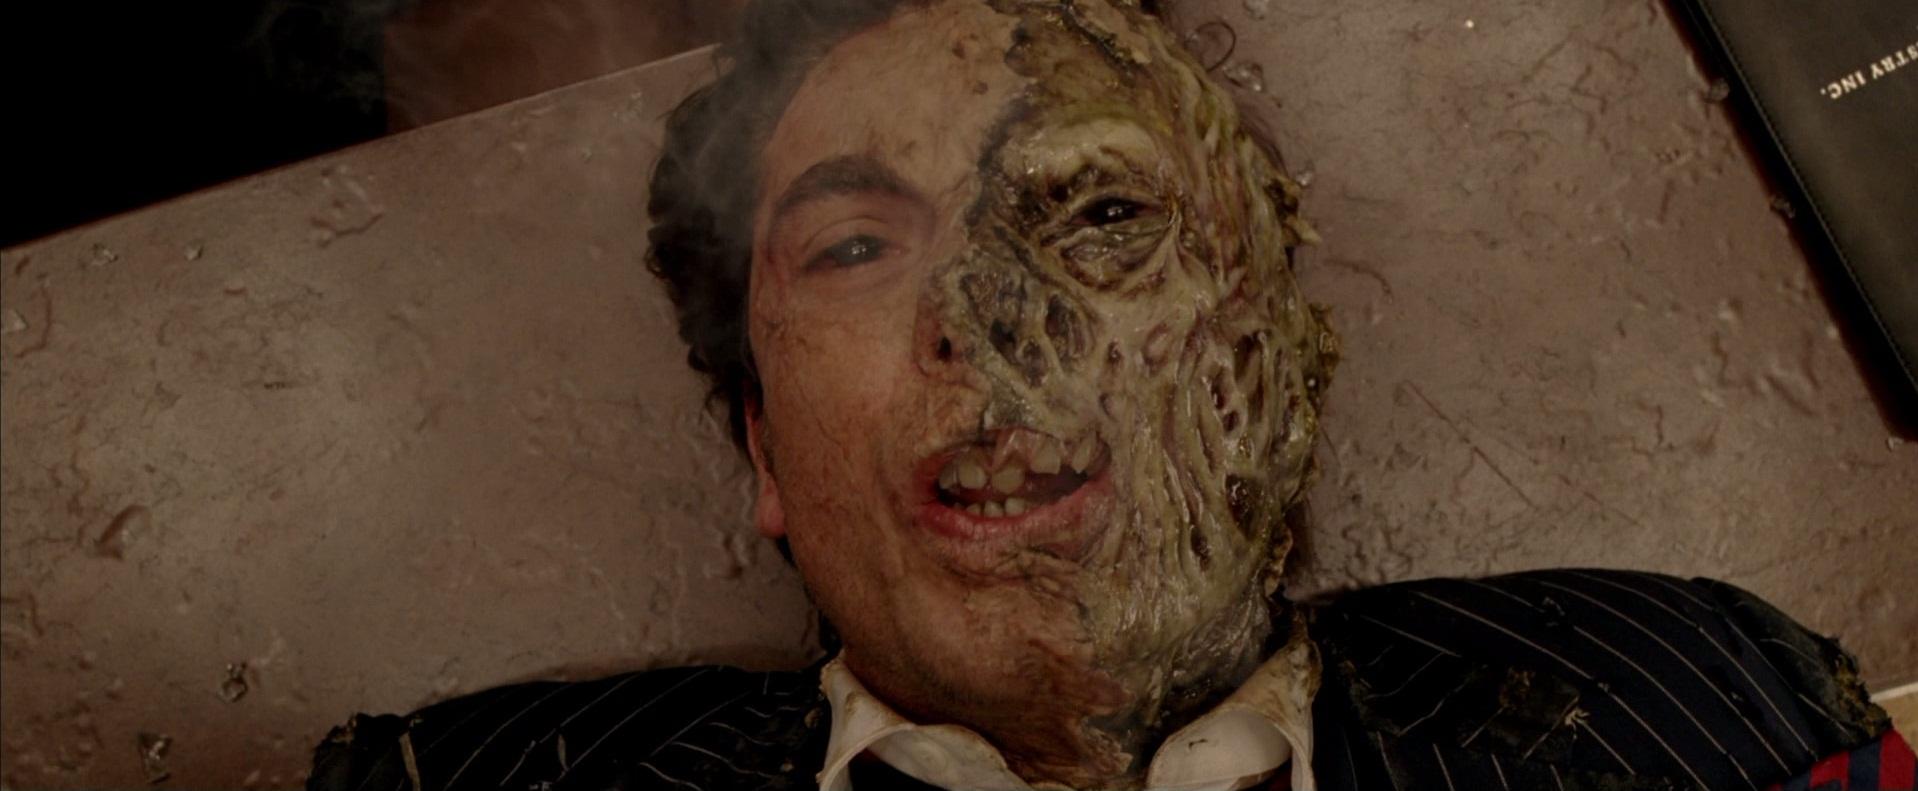 constantine-gavin-rossdale-glycerine-demon-movie